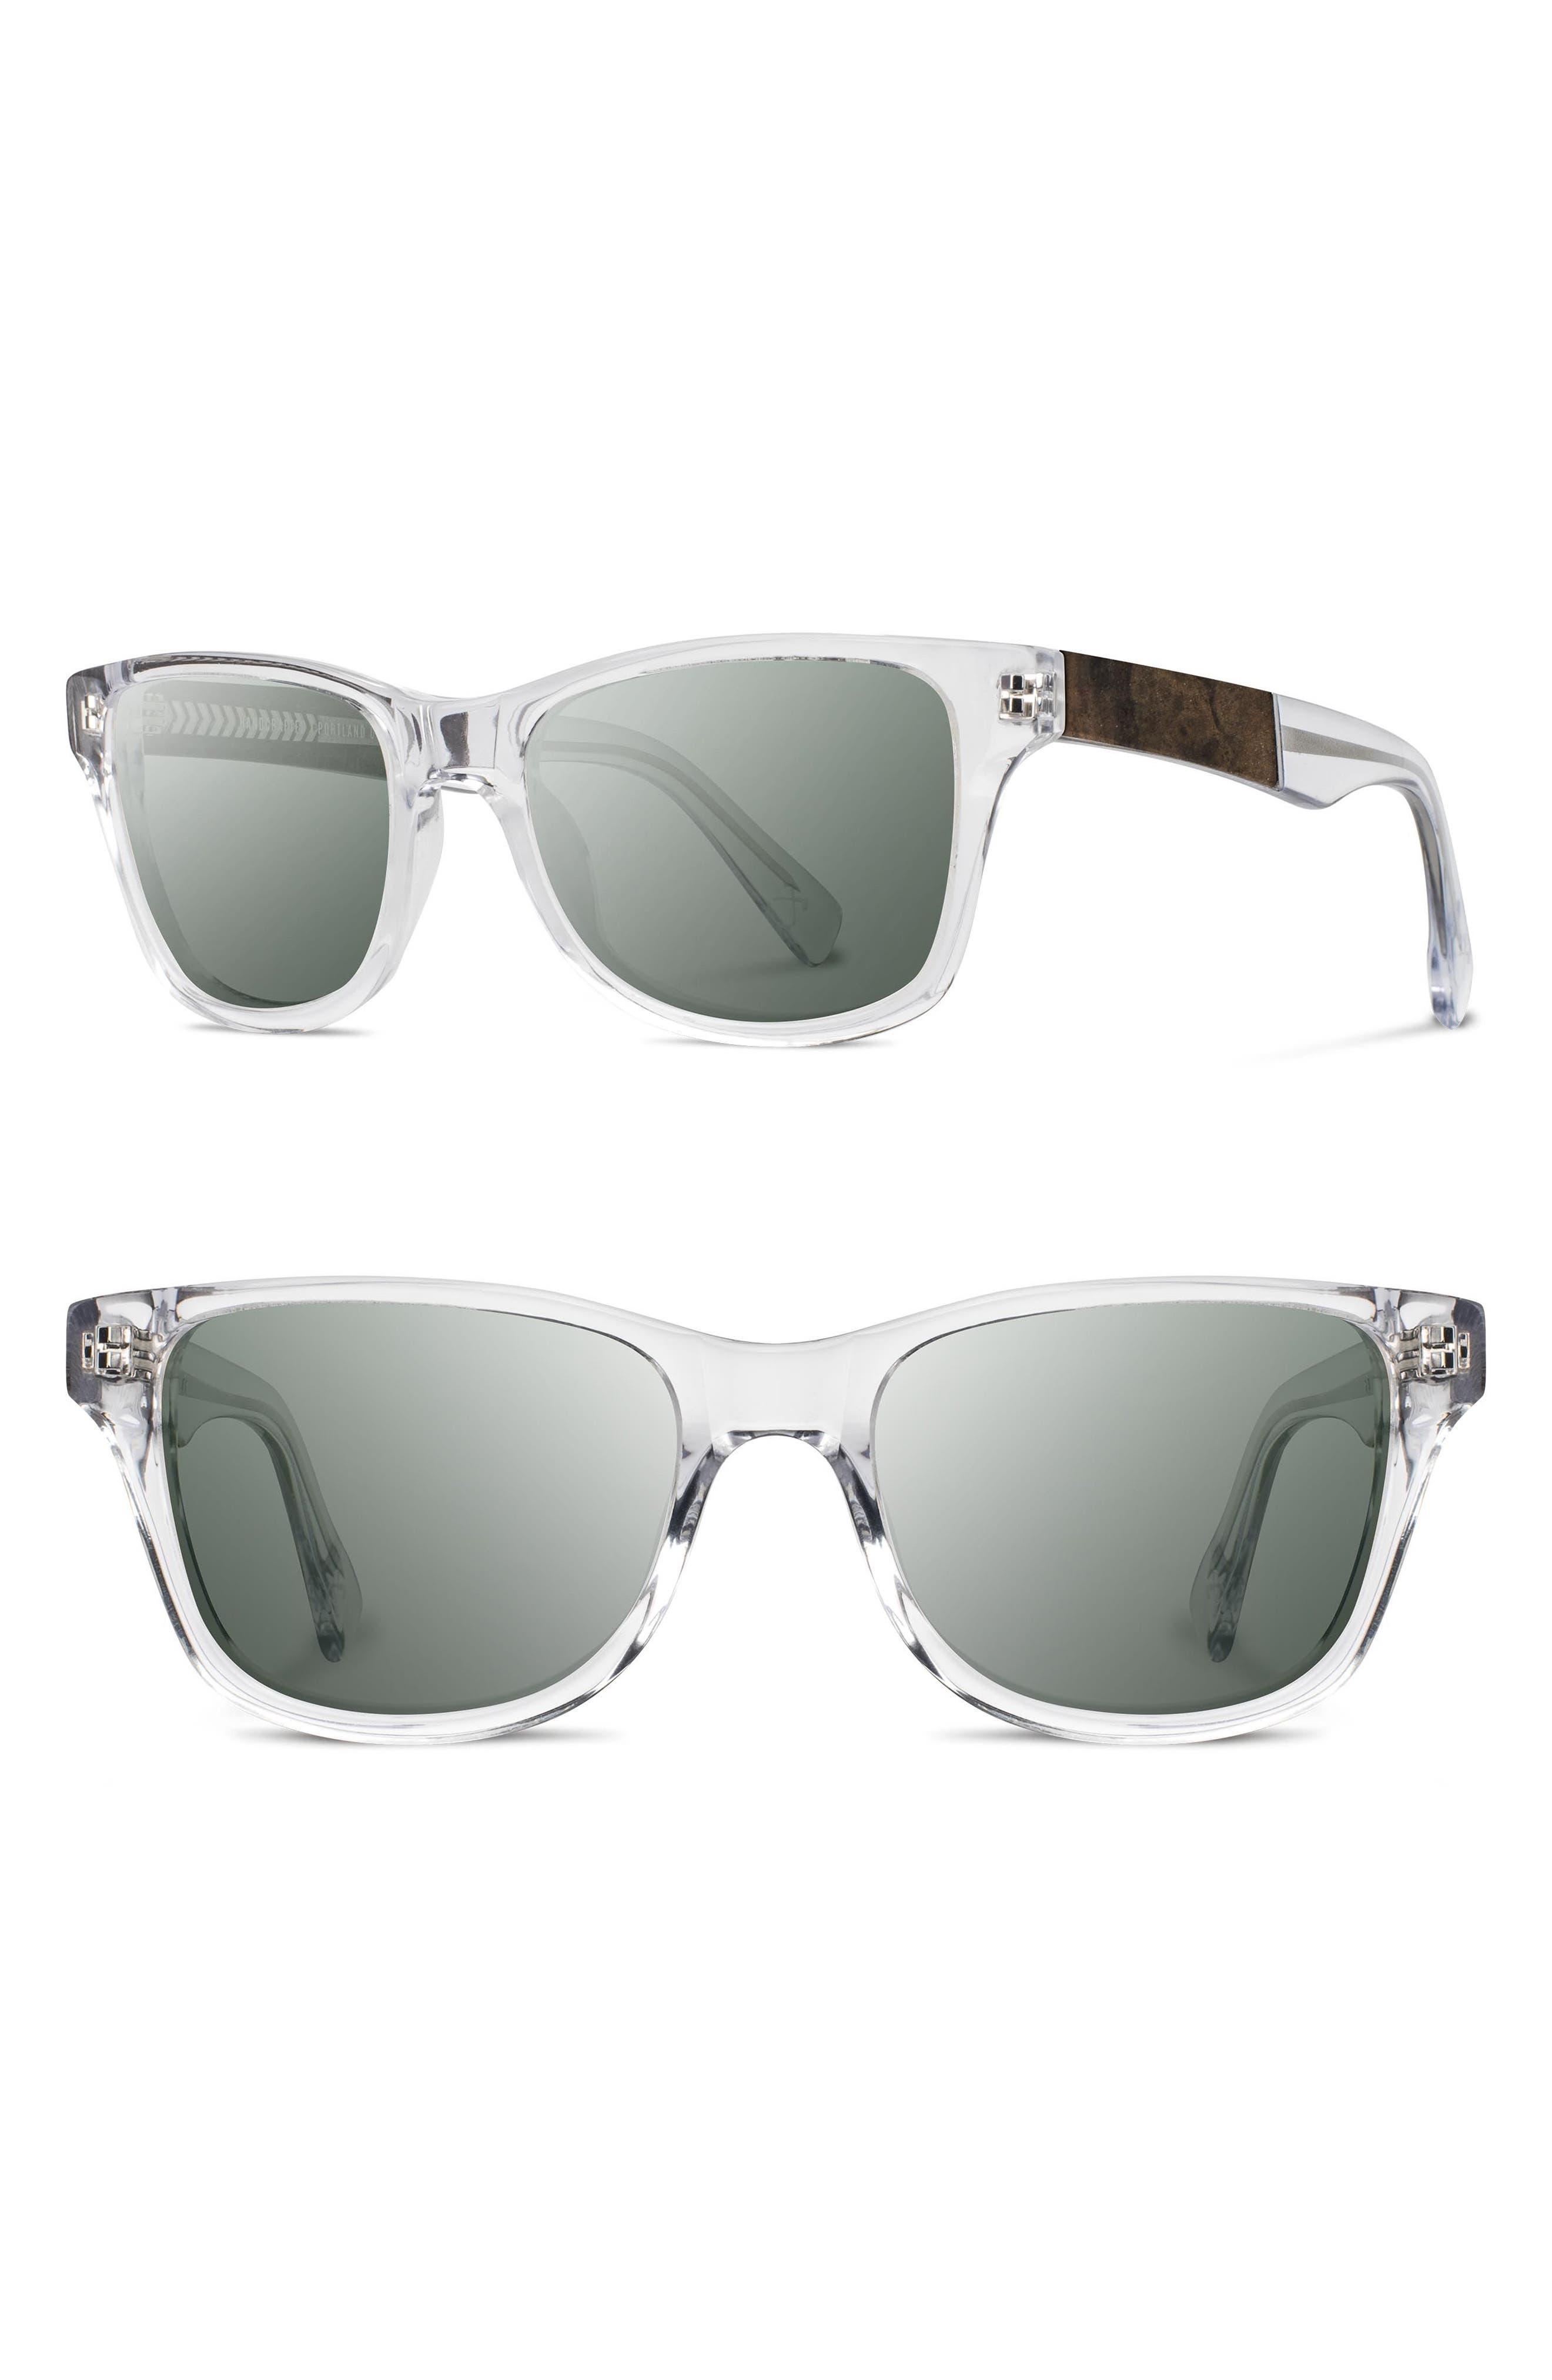 Main Image - Shwood 'Canby' 54mm Acetate & Wood Sunglasses